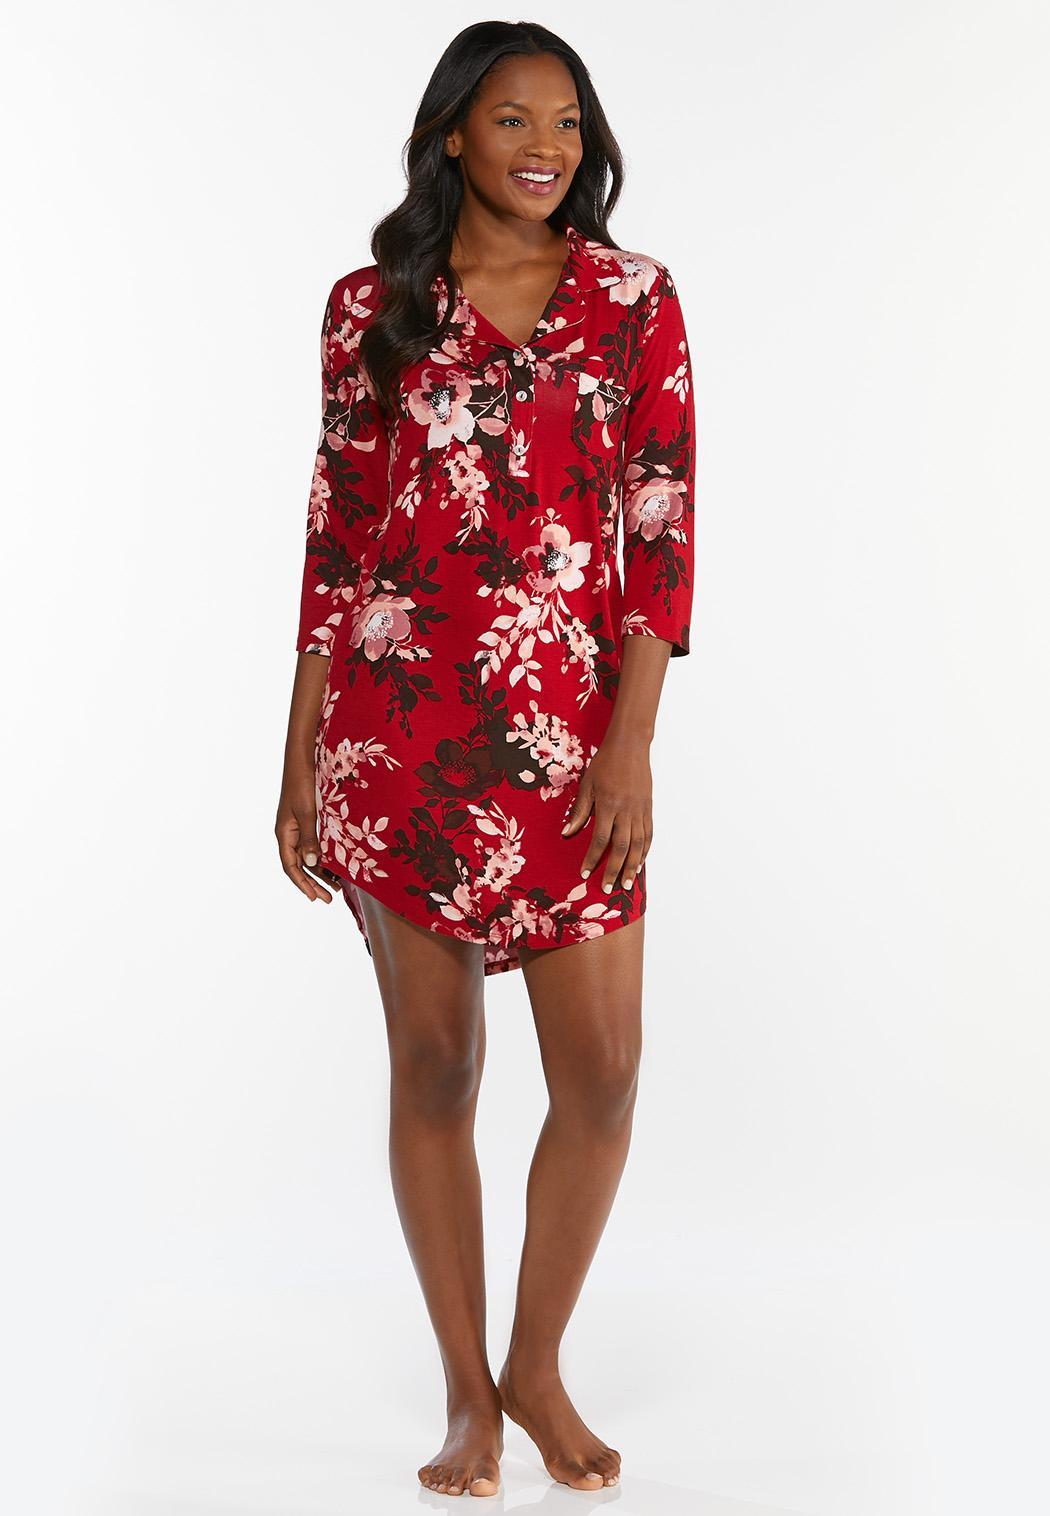 Red Floral Sleep Shirt